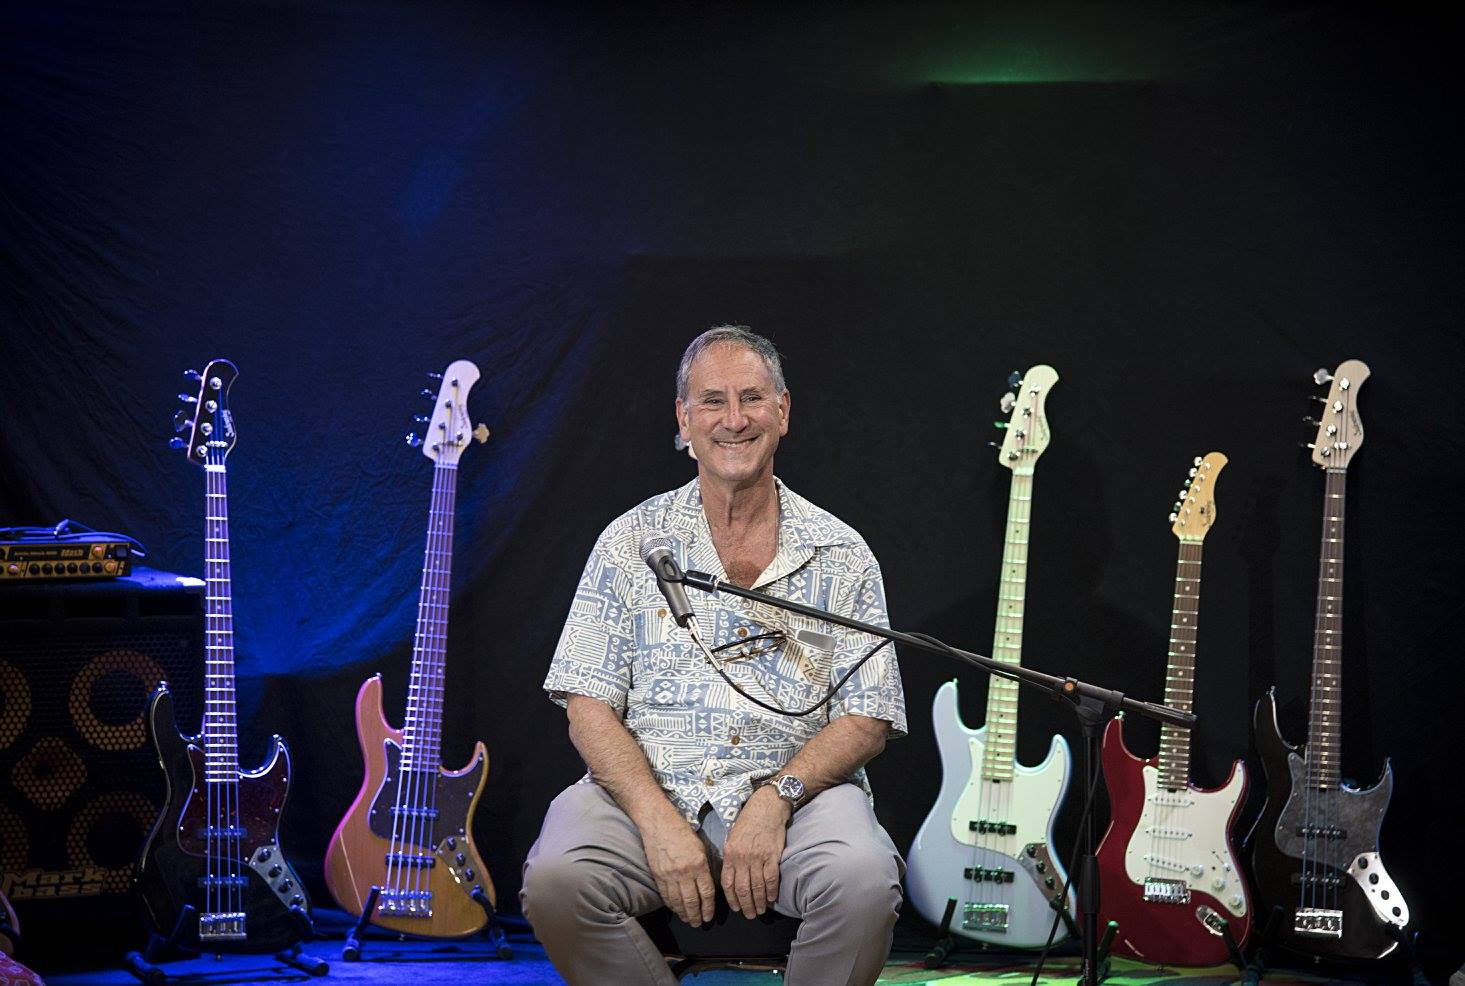 Roger Sadowsky Clinic il 24 Giugno a Your Music